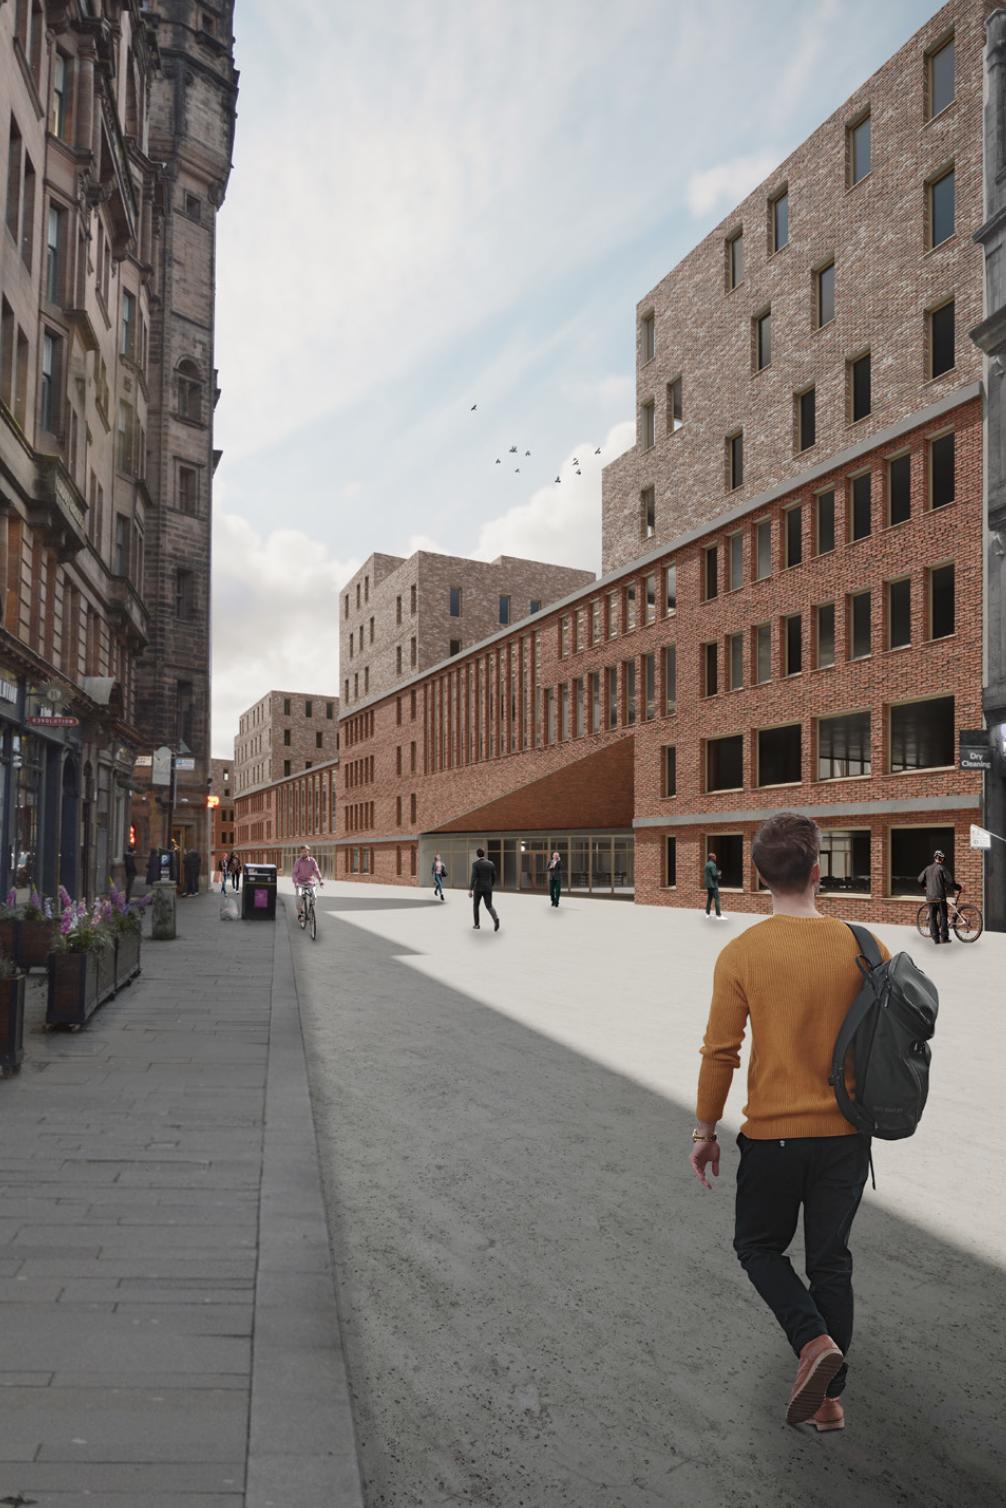 Urban Hybrid: The Redesign of the Urban Block